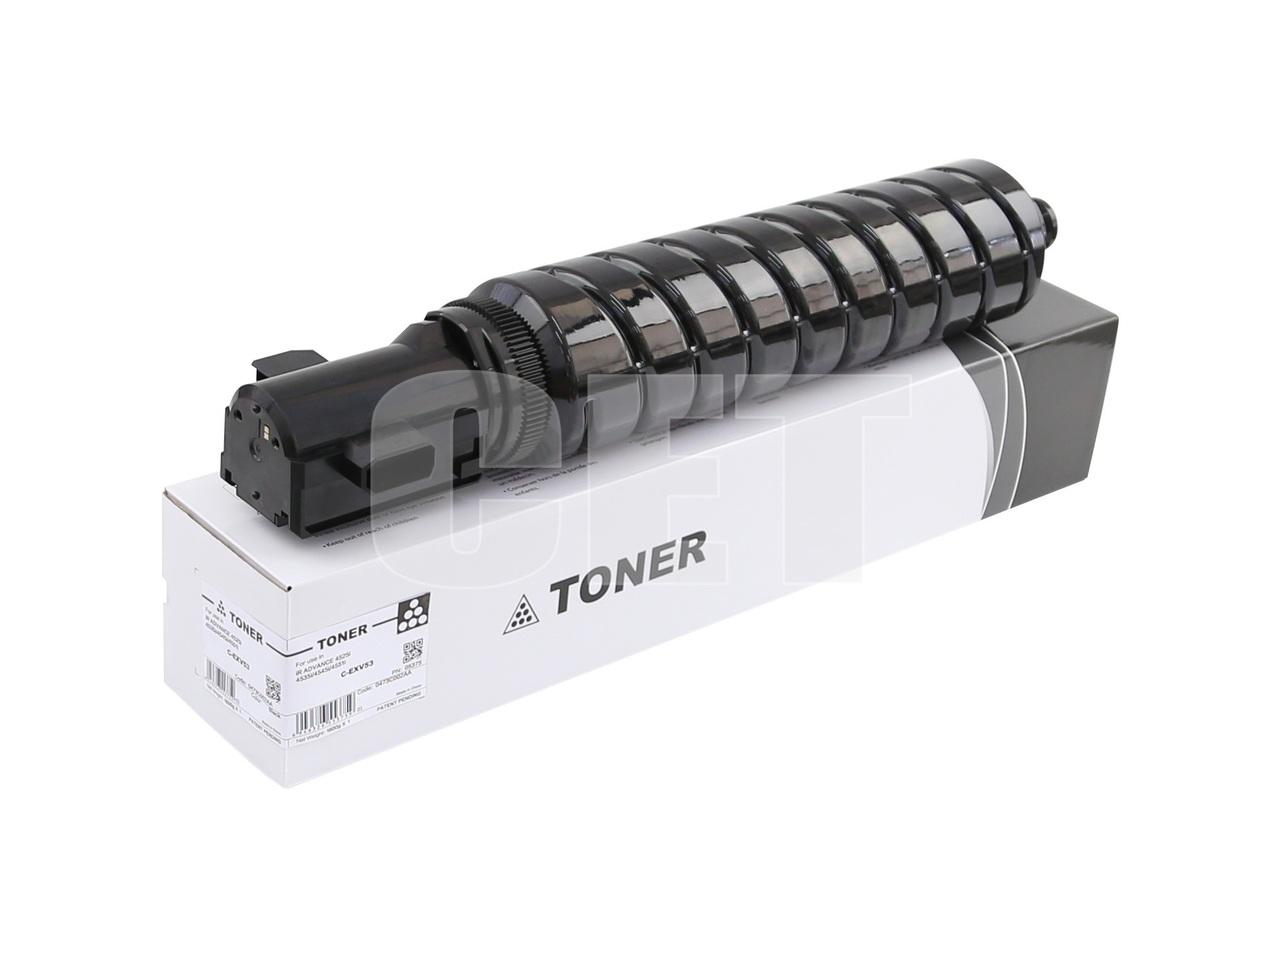 Тонер-картридж (CPP) C-EXV53 для CANON iR ADVANCE4525i/4535i/4545i/4551i (CET), 1747г, 42100 стр., CET5375